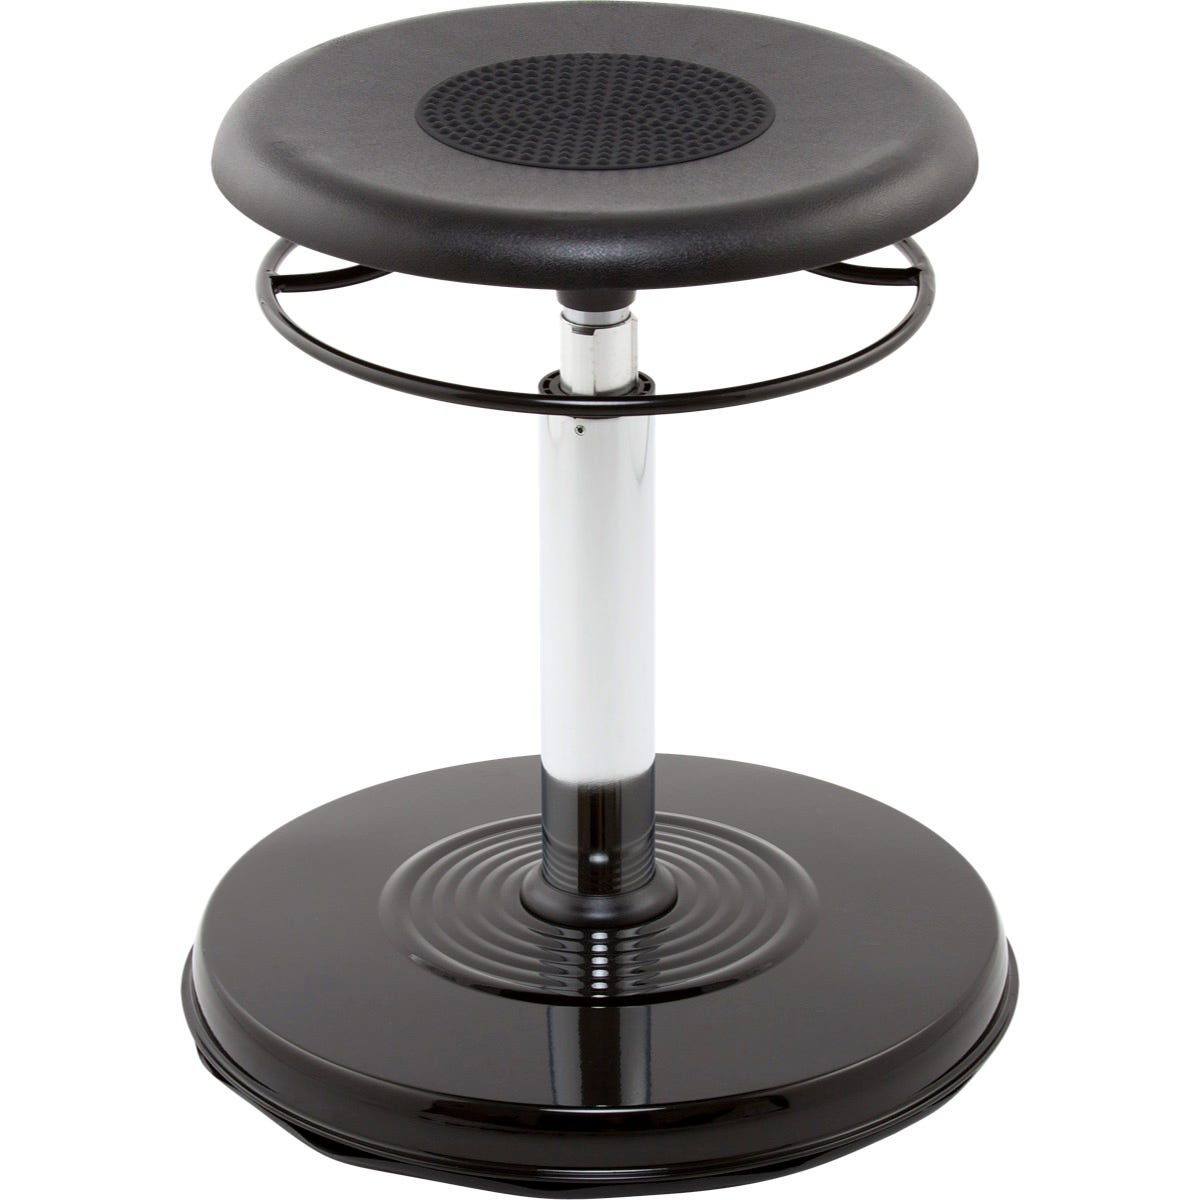 Kore Teen Adjustable Height Wobble Chair